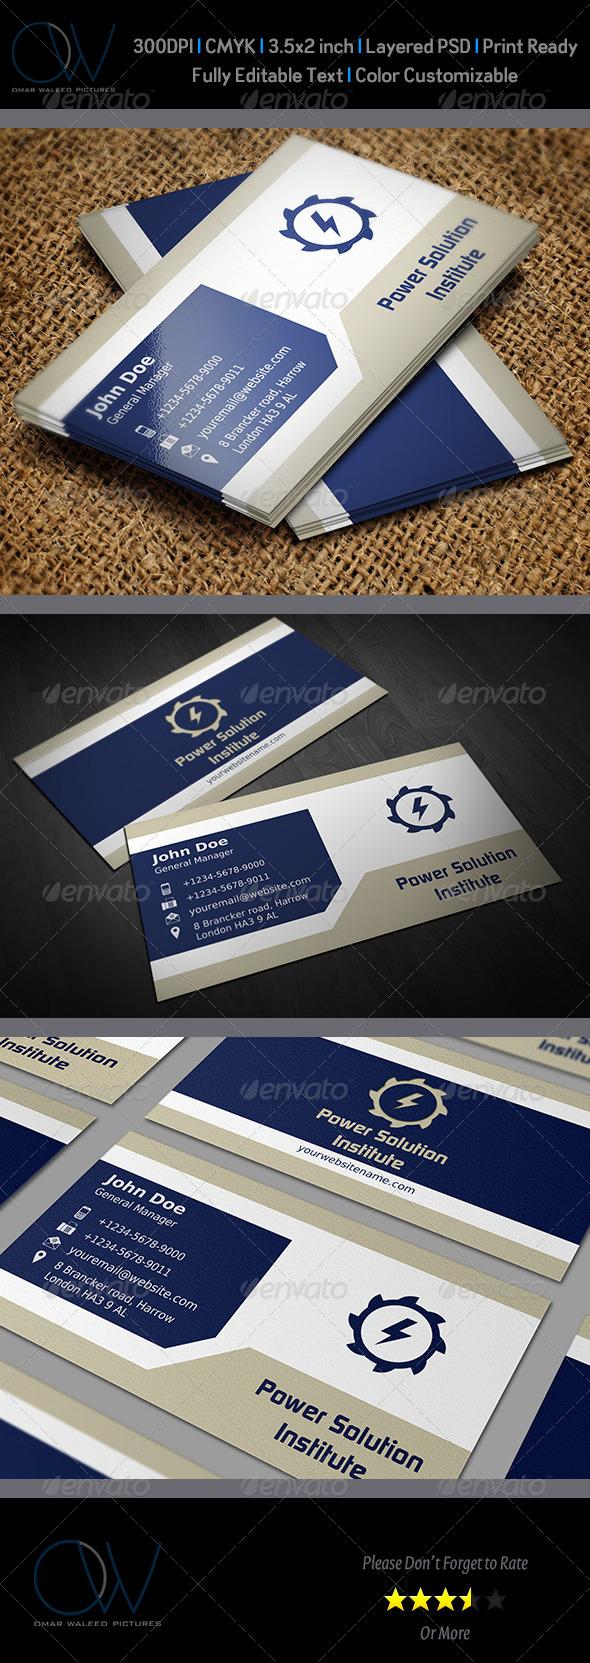 Corporate Business Card Template Vol.39 - Corporate Business Cards